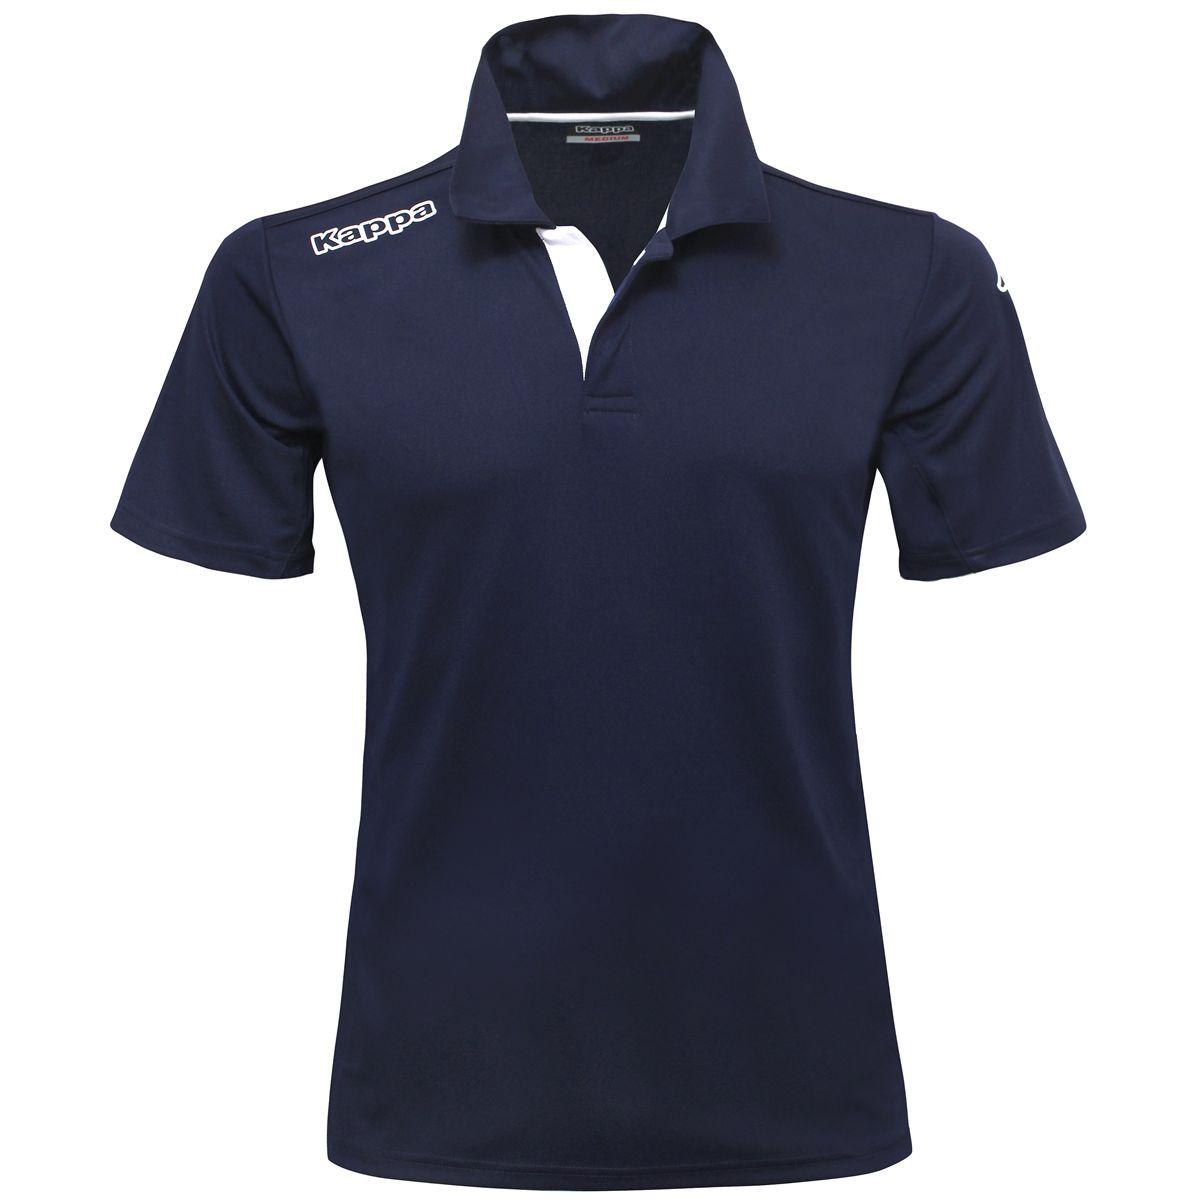 Kappa T-shirt sportiva Uomo KAPPA4GOLF SICET Golf sport Polo 9